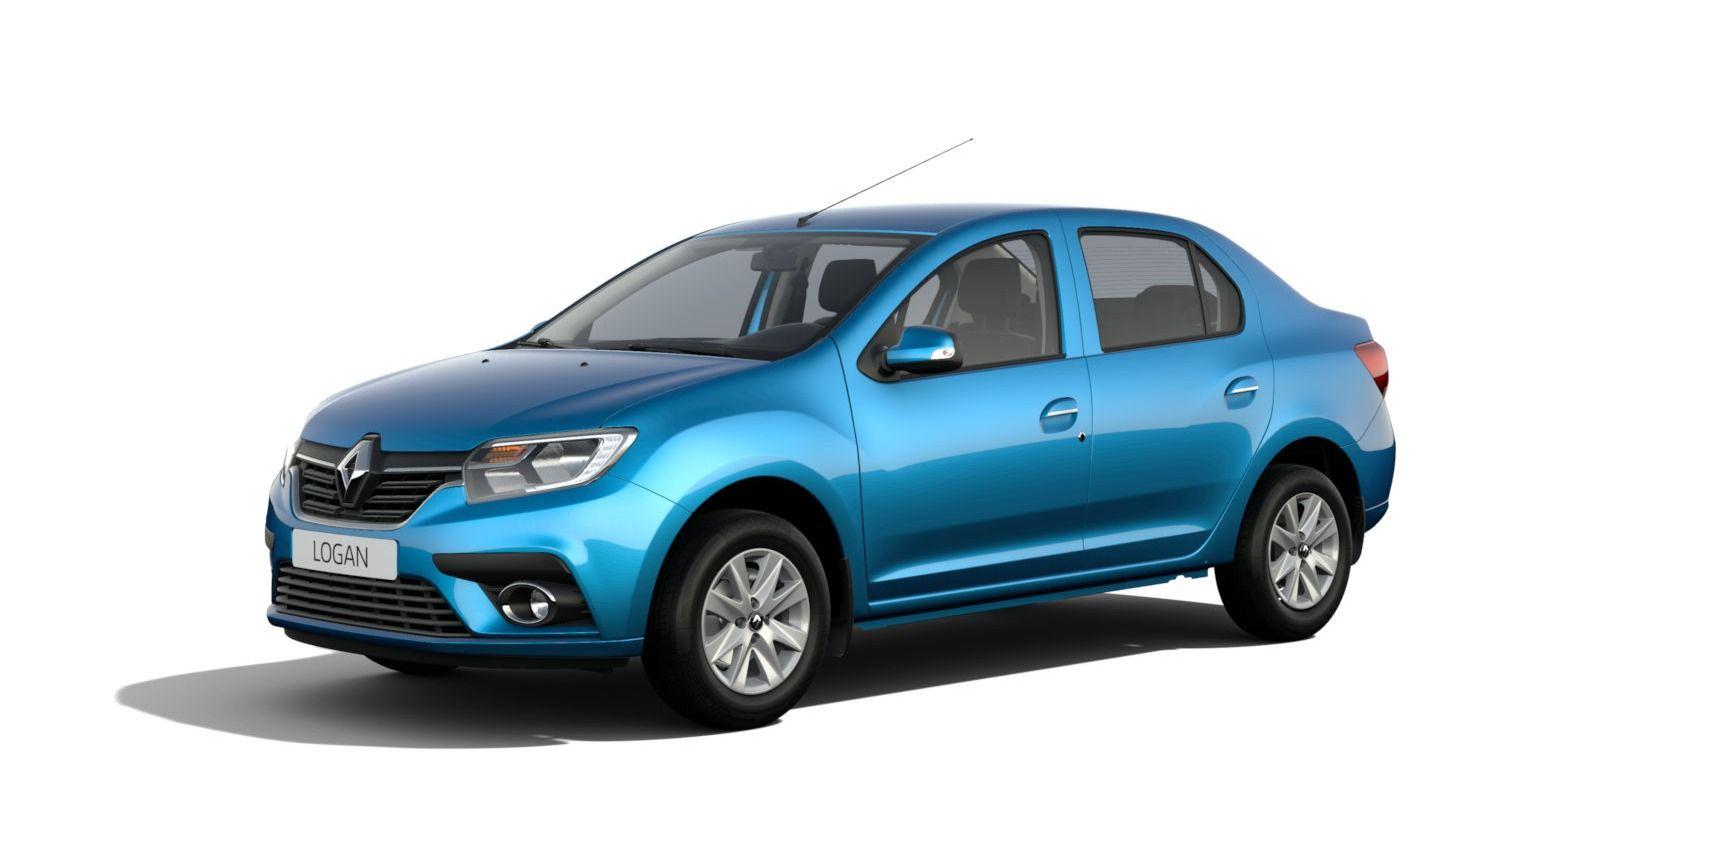 Renault Logan Седан (Drive)